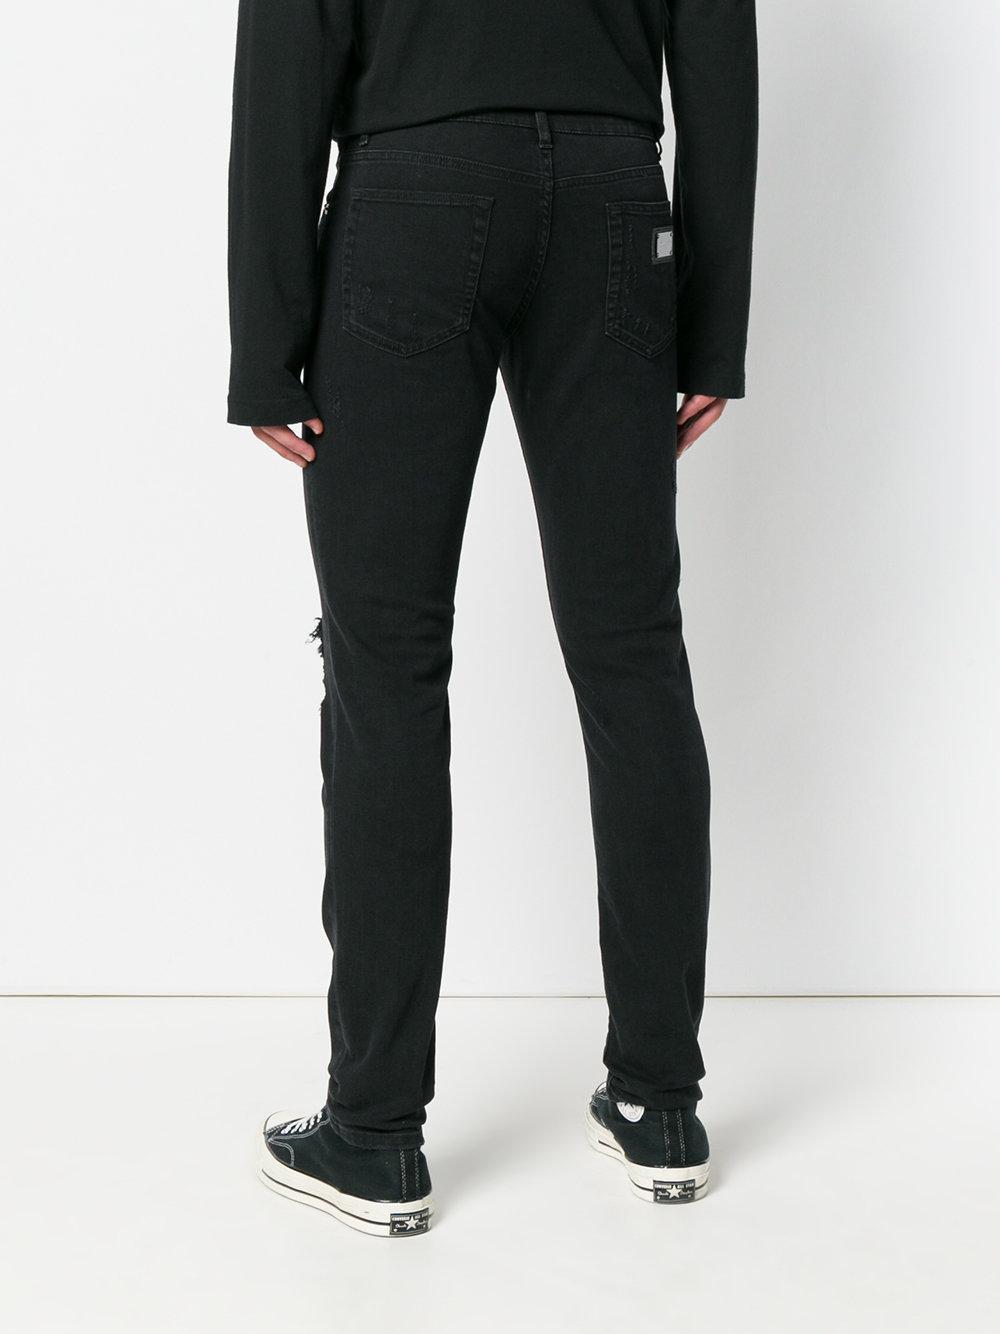 crest embroidered skinny jeans - Black Dolce & Gabbana oCcbWMAsm